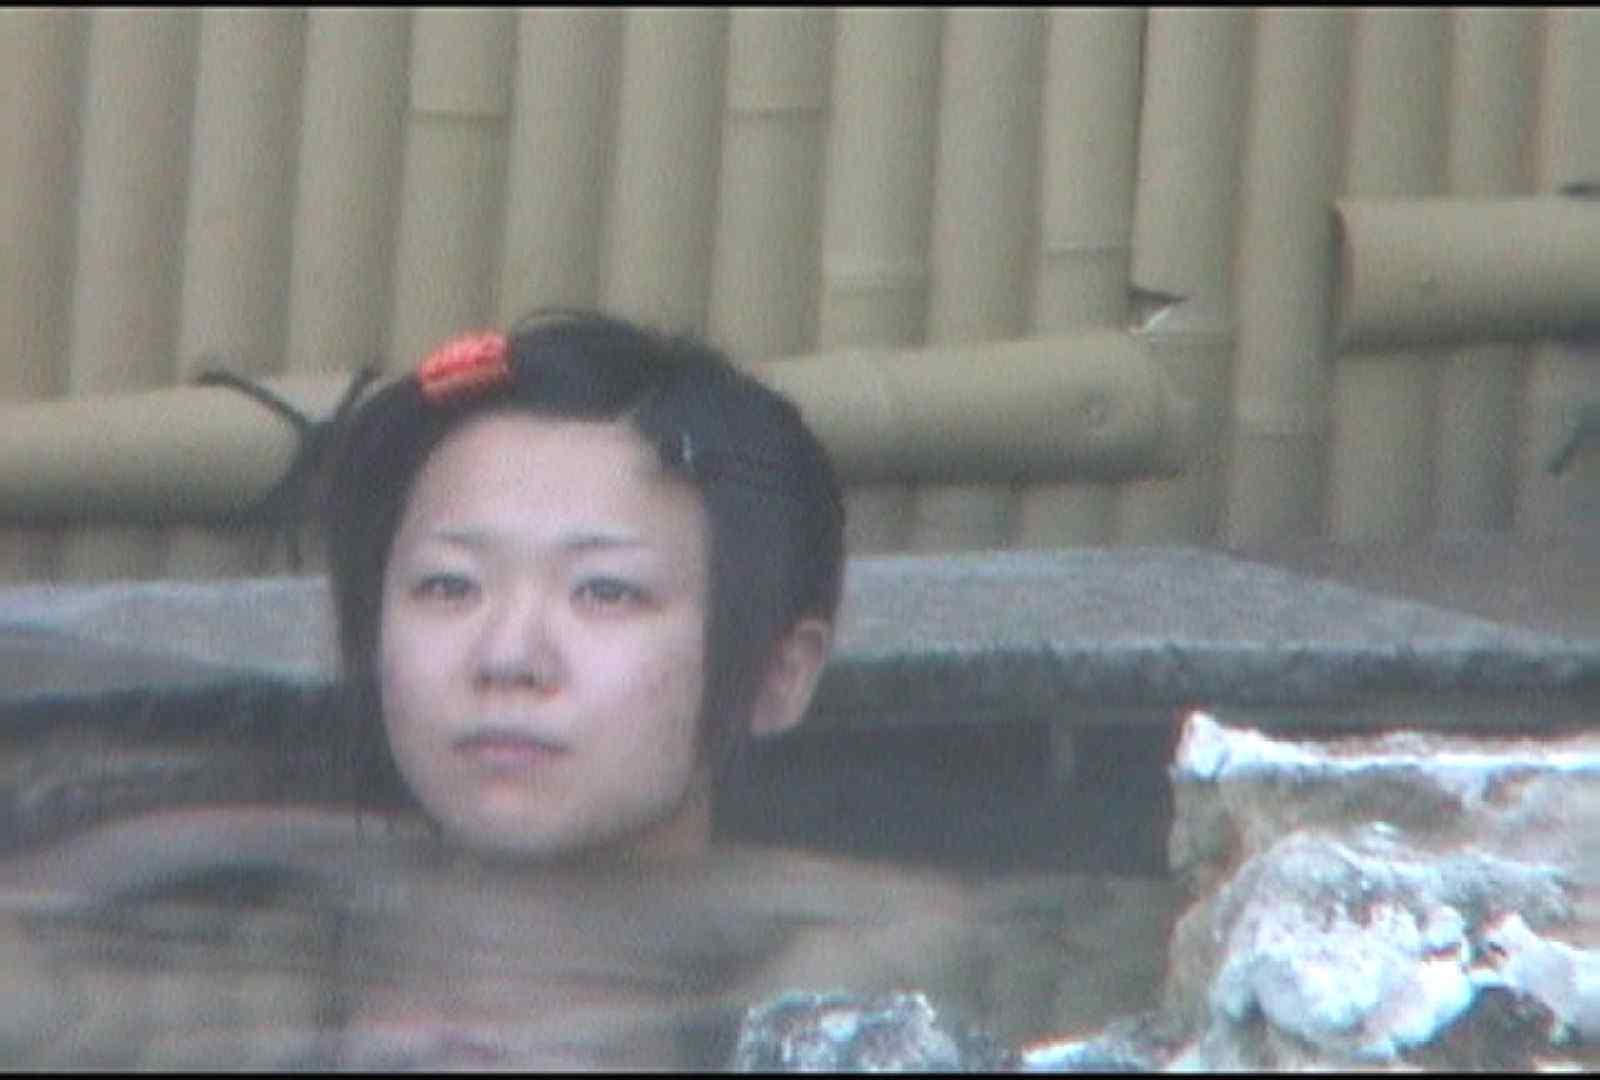 Aquaな露天風呂Vol.175 盗撮シリーズ | 露天風呂編  91PIX 43